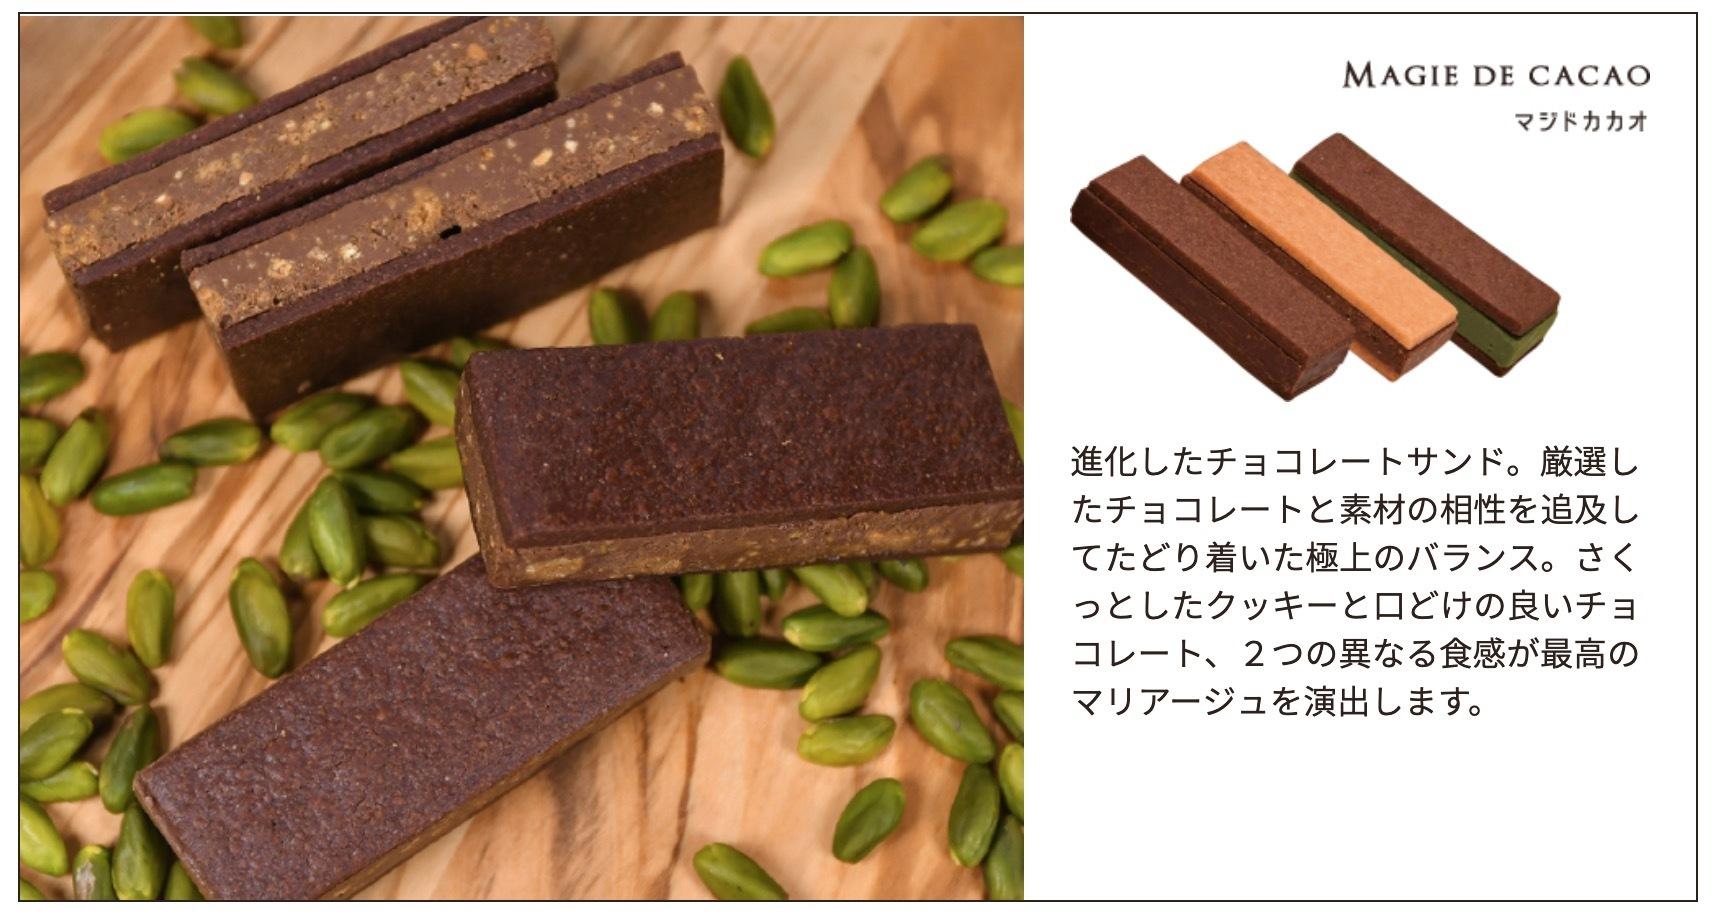 Magie du chocolat(マジドショコラ)@自由が丘 優雅なチョコレート屋さんでホワイトデーお返しと自分用ご褒美!_b0024832_00091805.jpg